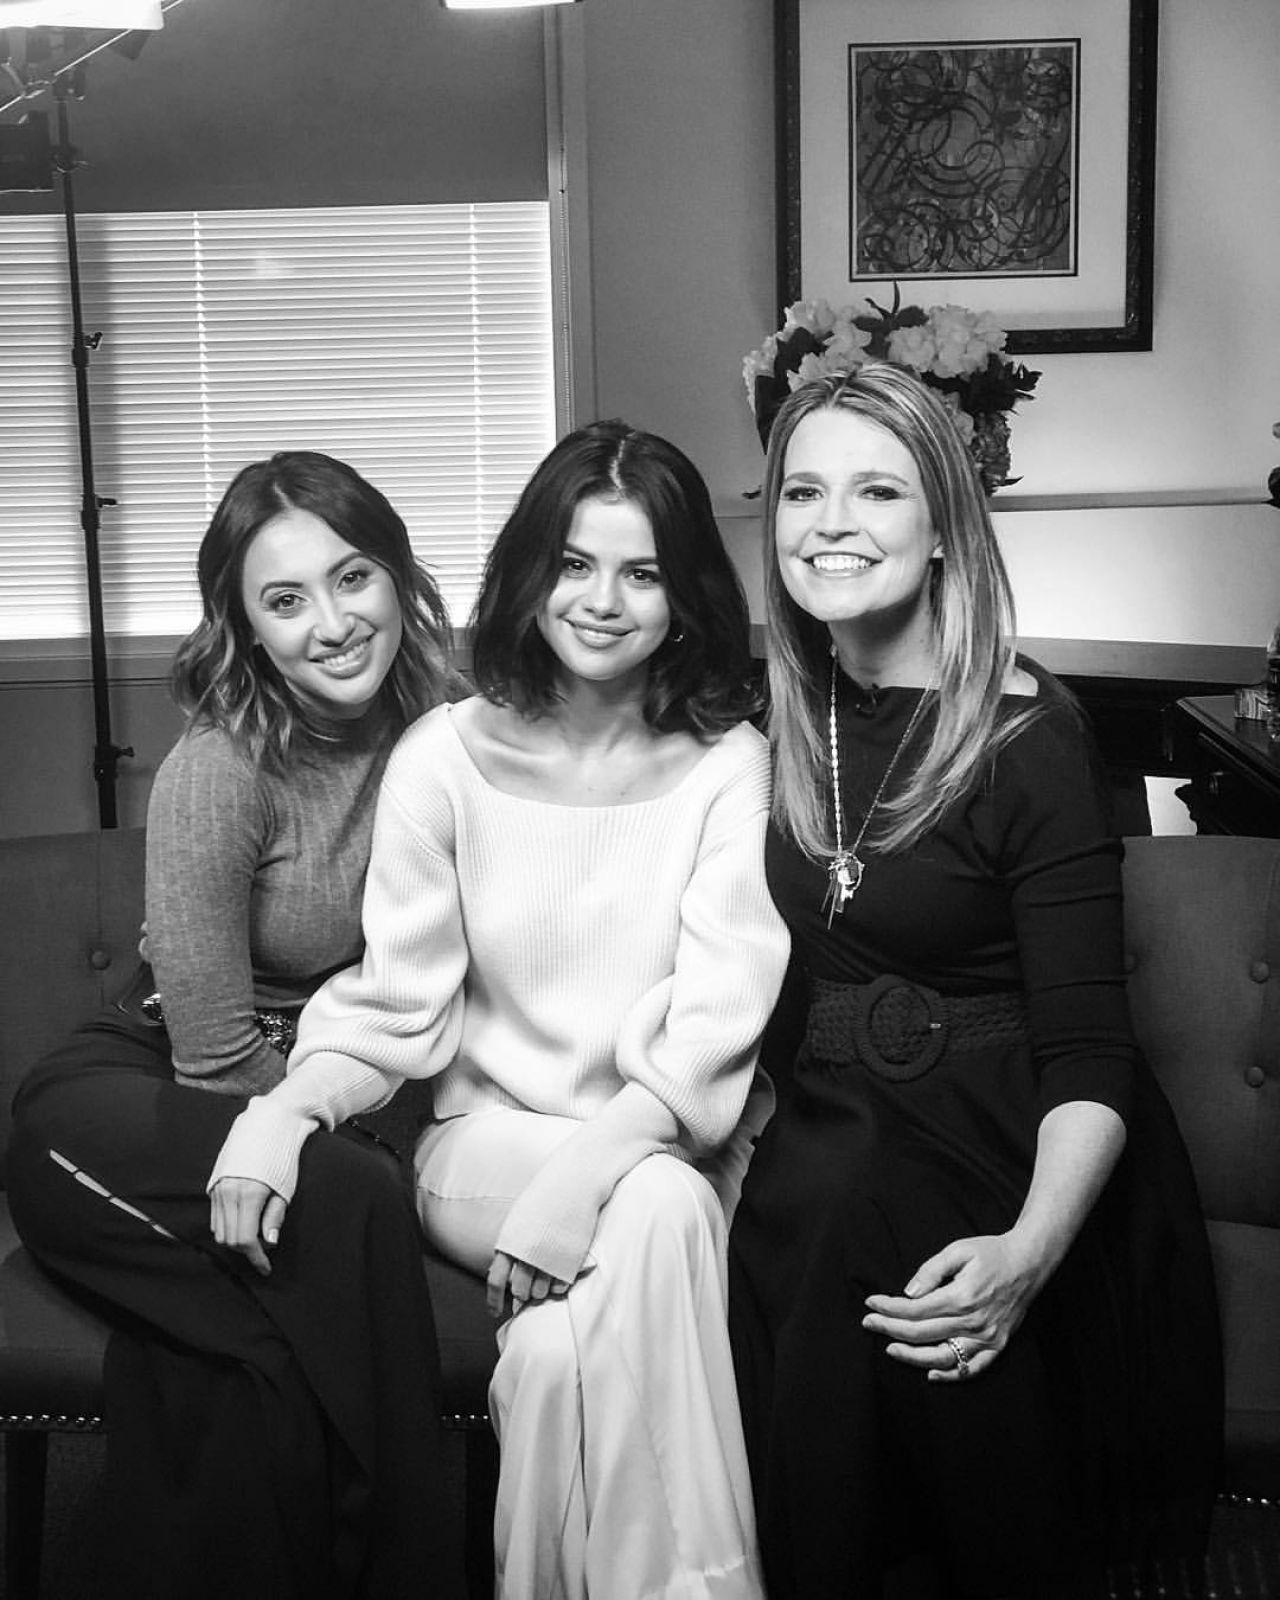 Selena Gomez & Francia Raisa - The Today Show 10/27/2017